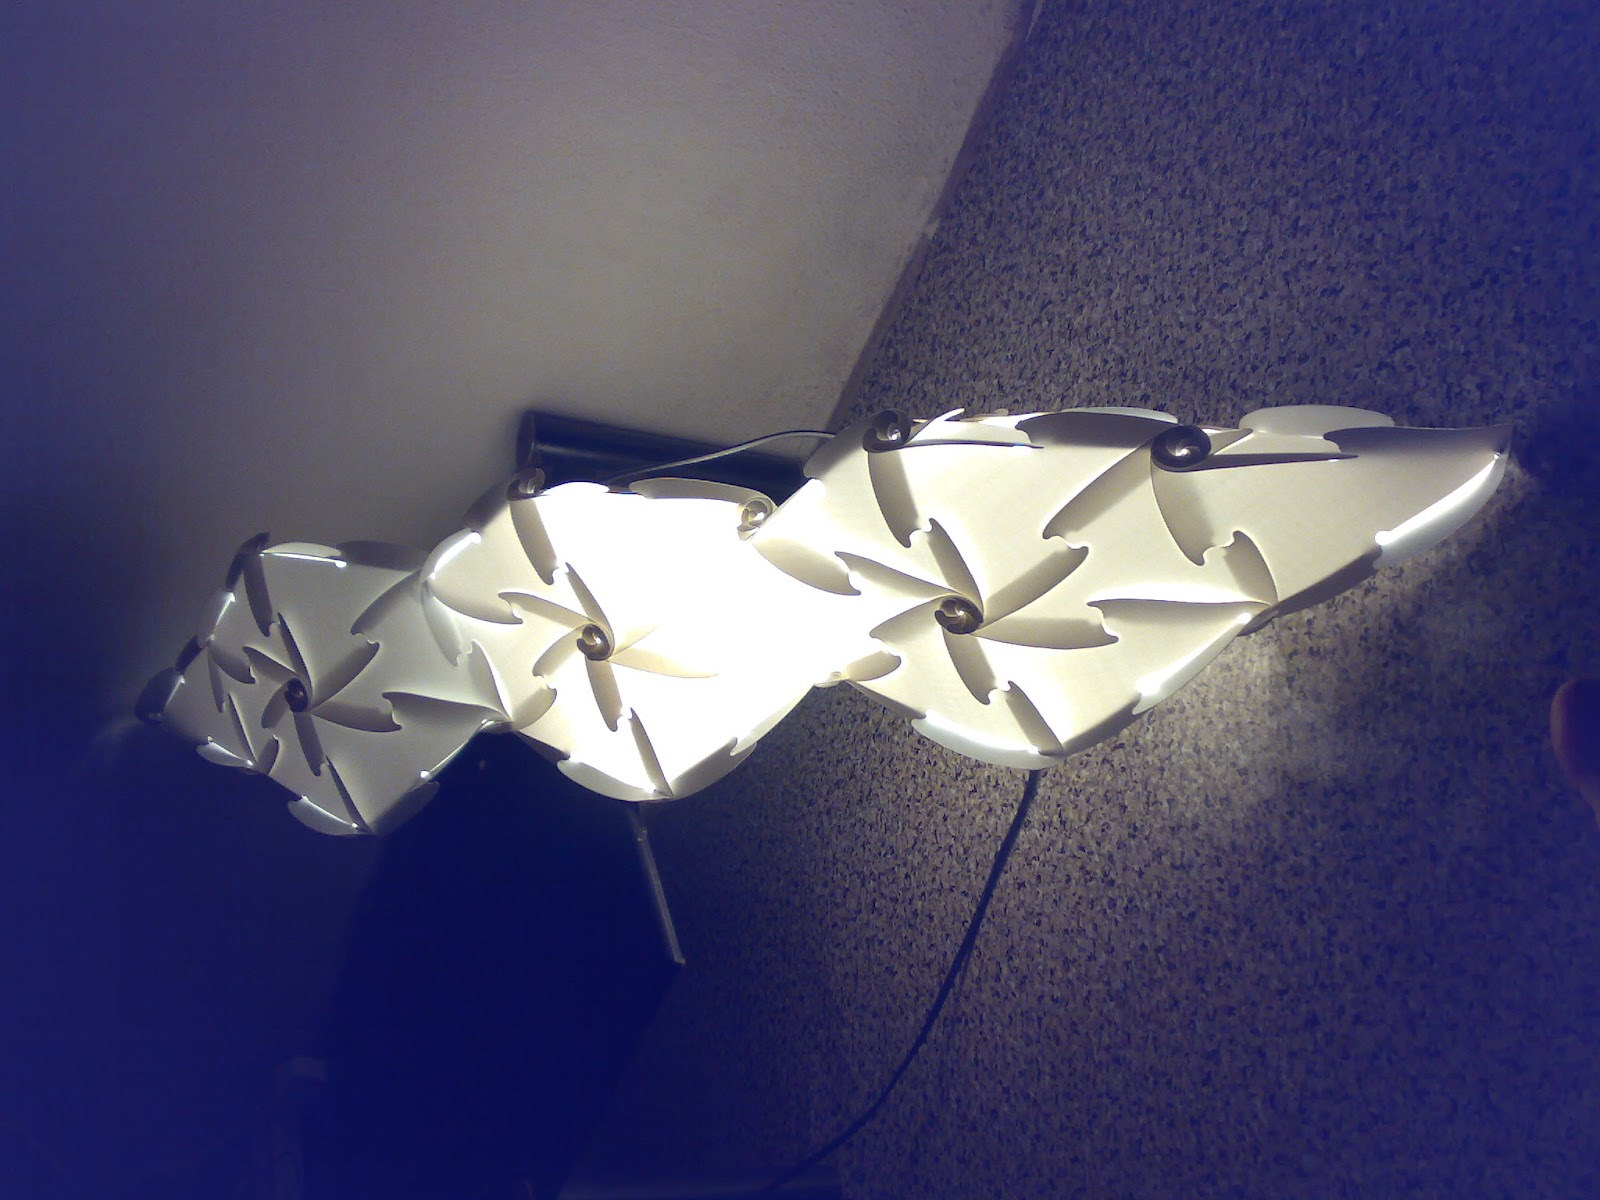 vlightdeco iq light puzzle pendant jigsaw lamp styles iq light jigsaw lamp vlightdeco triagle. Black Bedroom Furniture Sets. Home Design Ideas